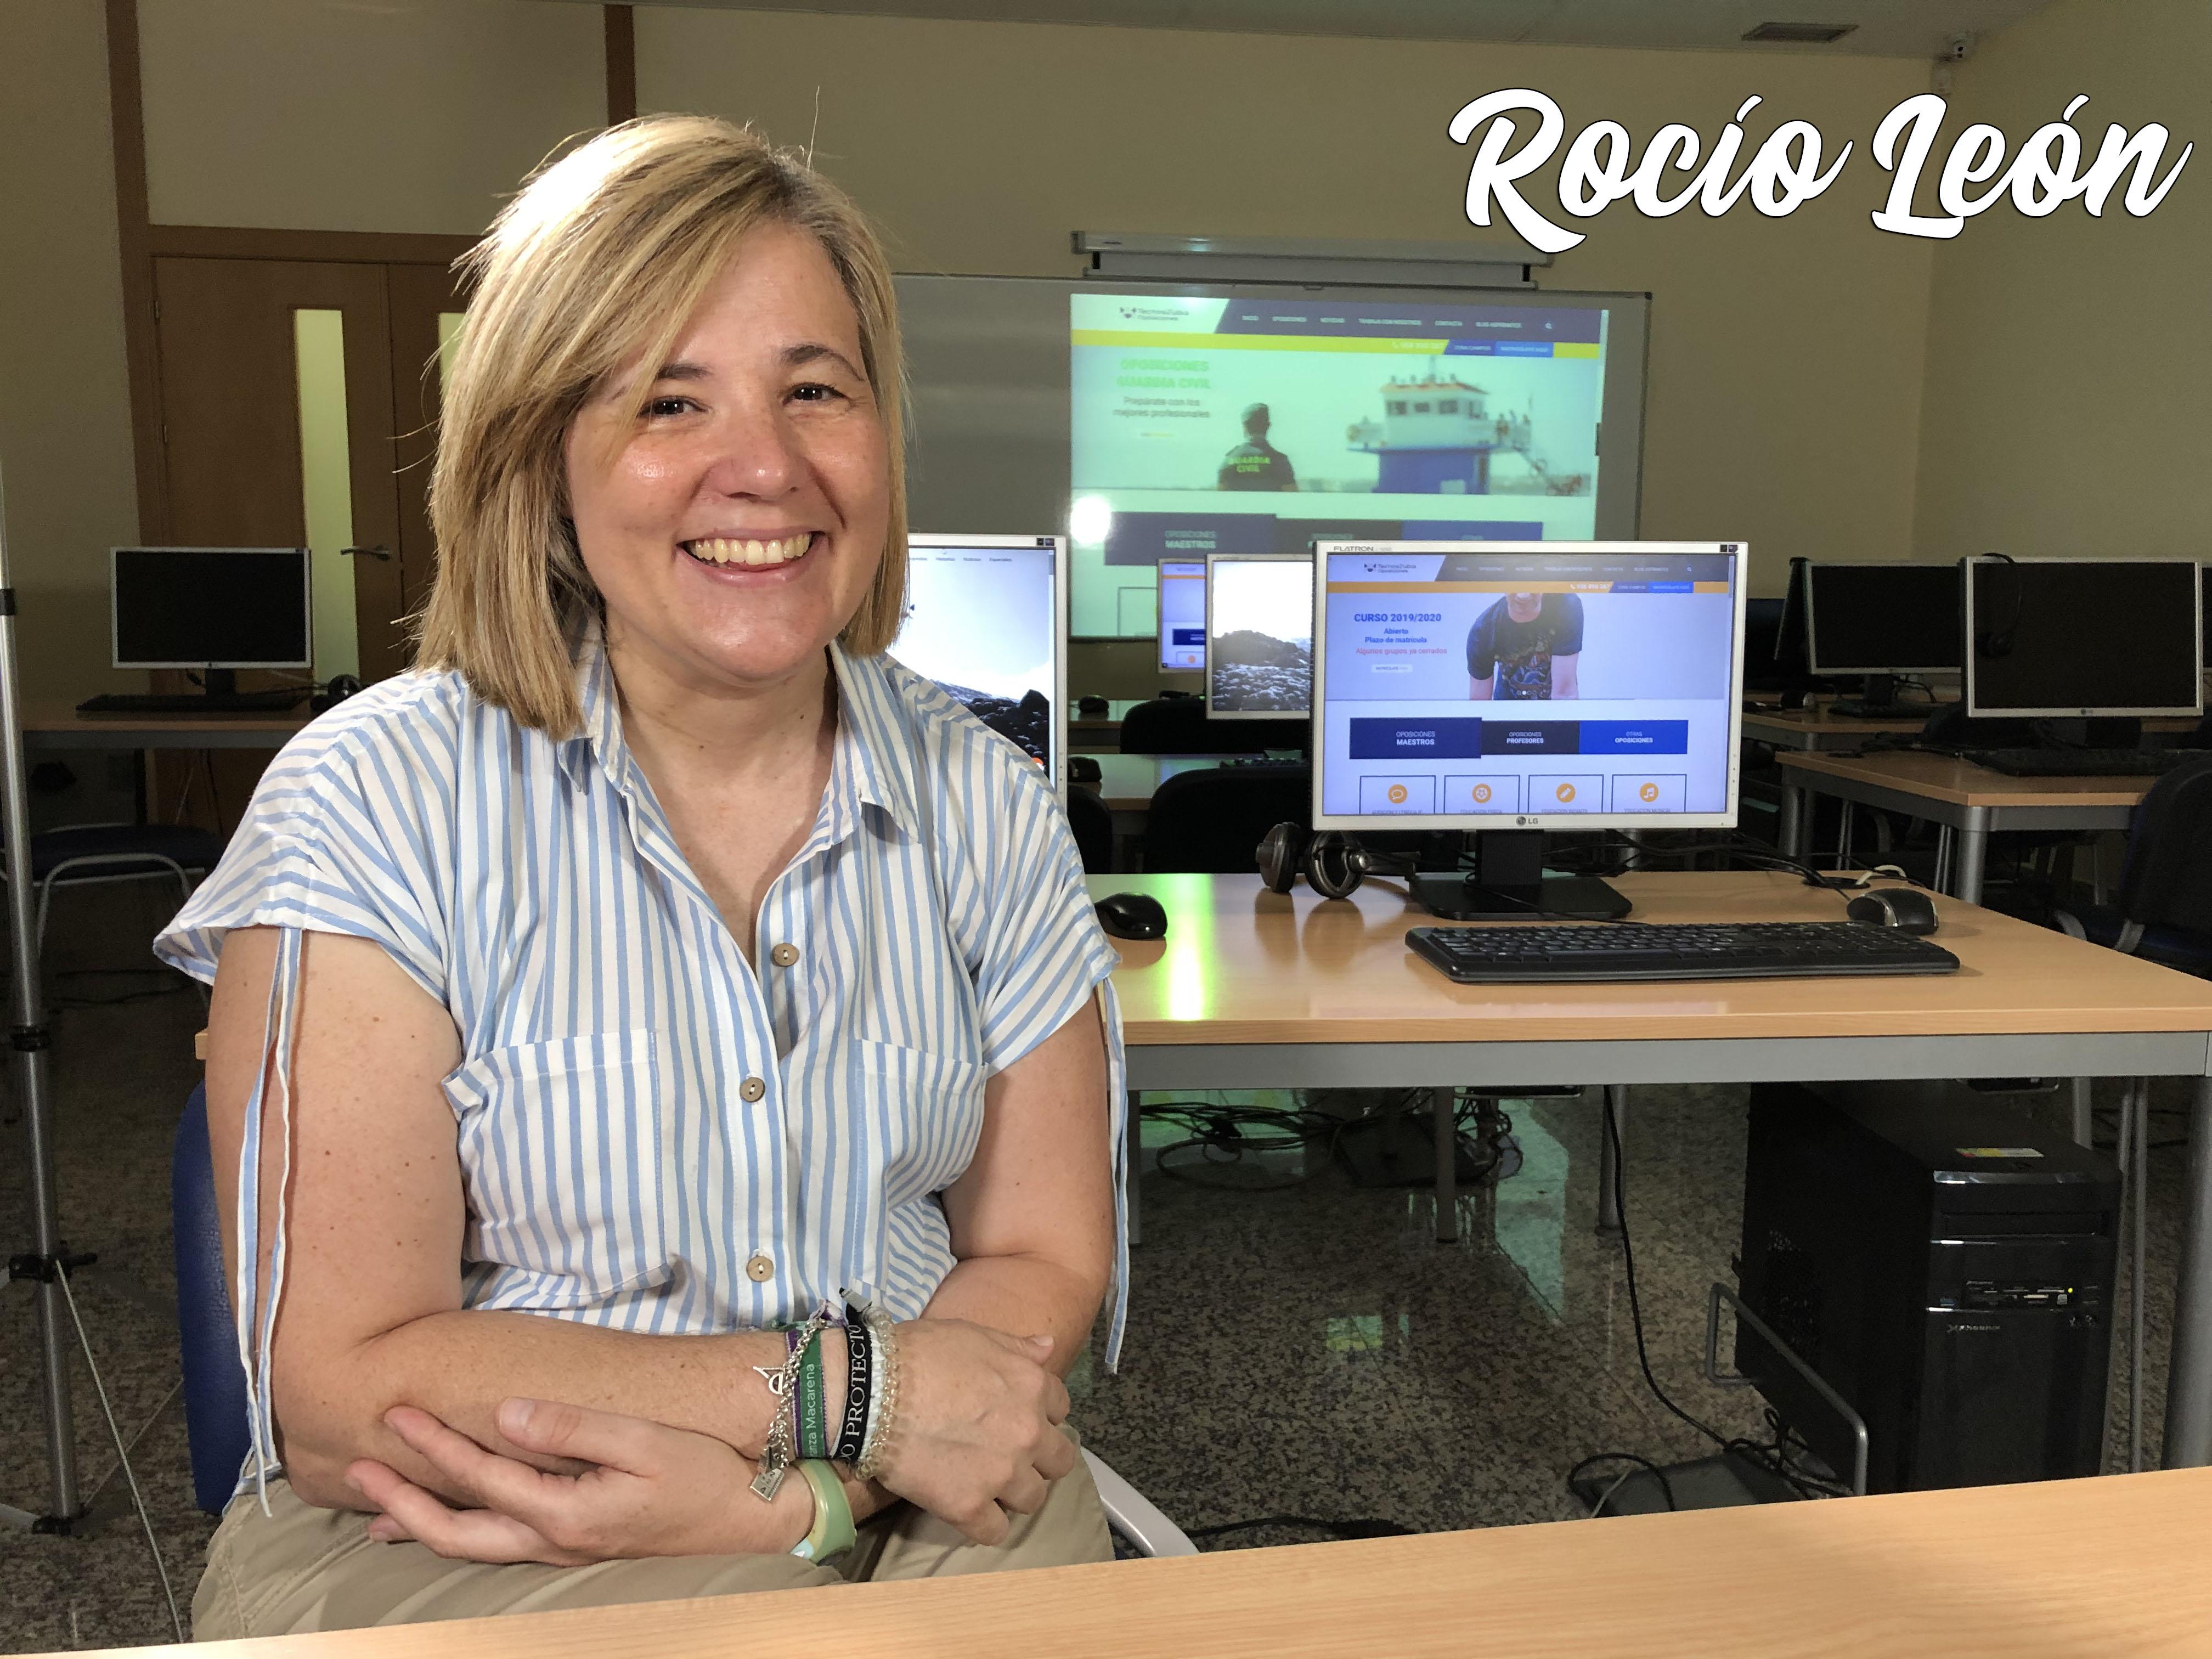 Entrevista a Rocío León, primera maestra con discapacidad intelectual en conseguir plaza.